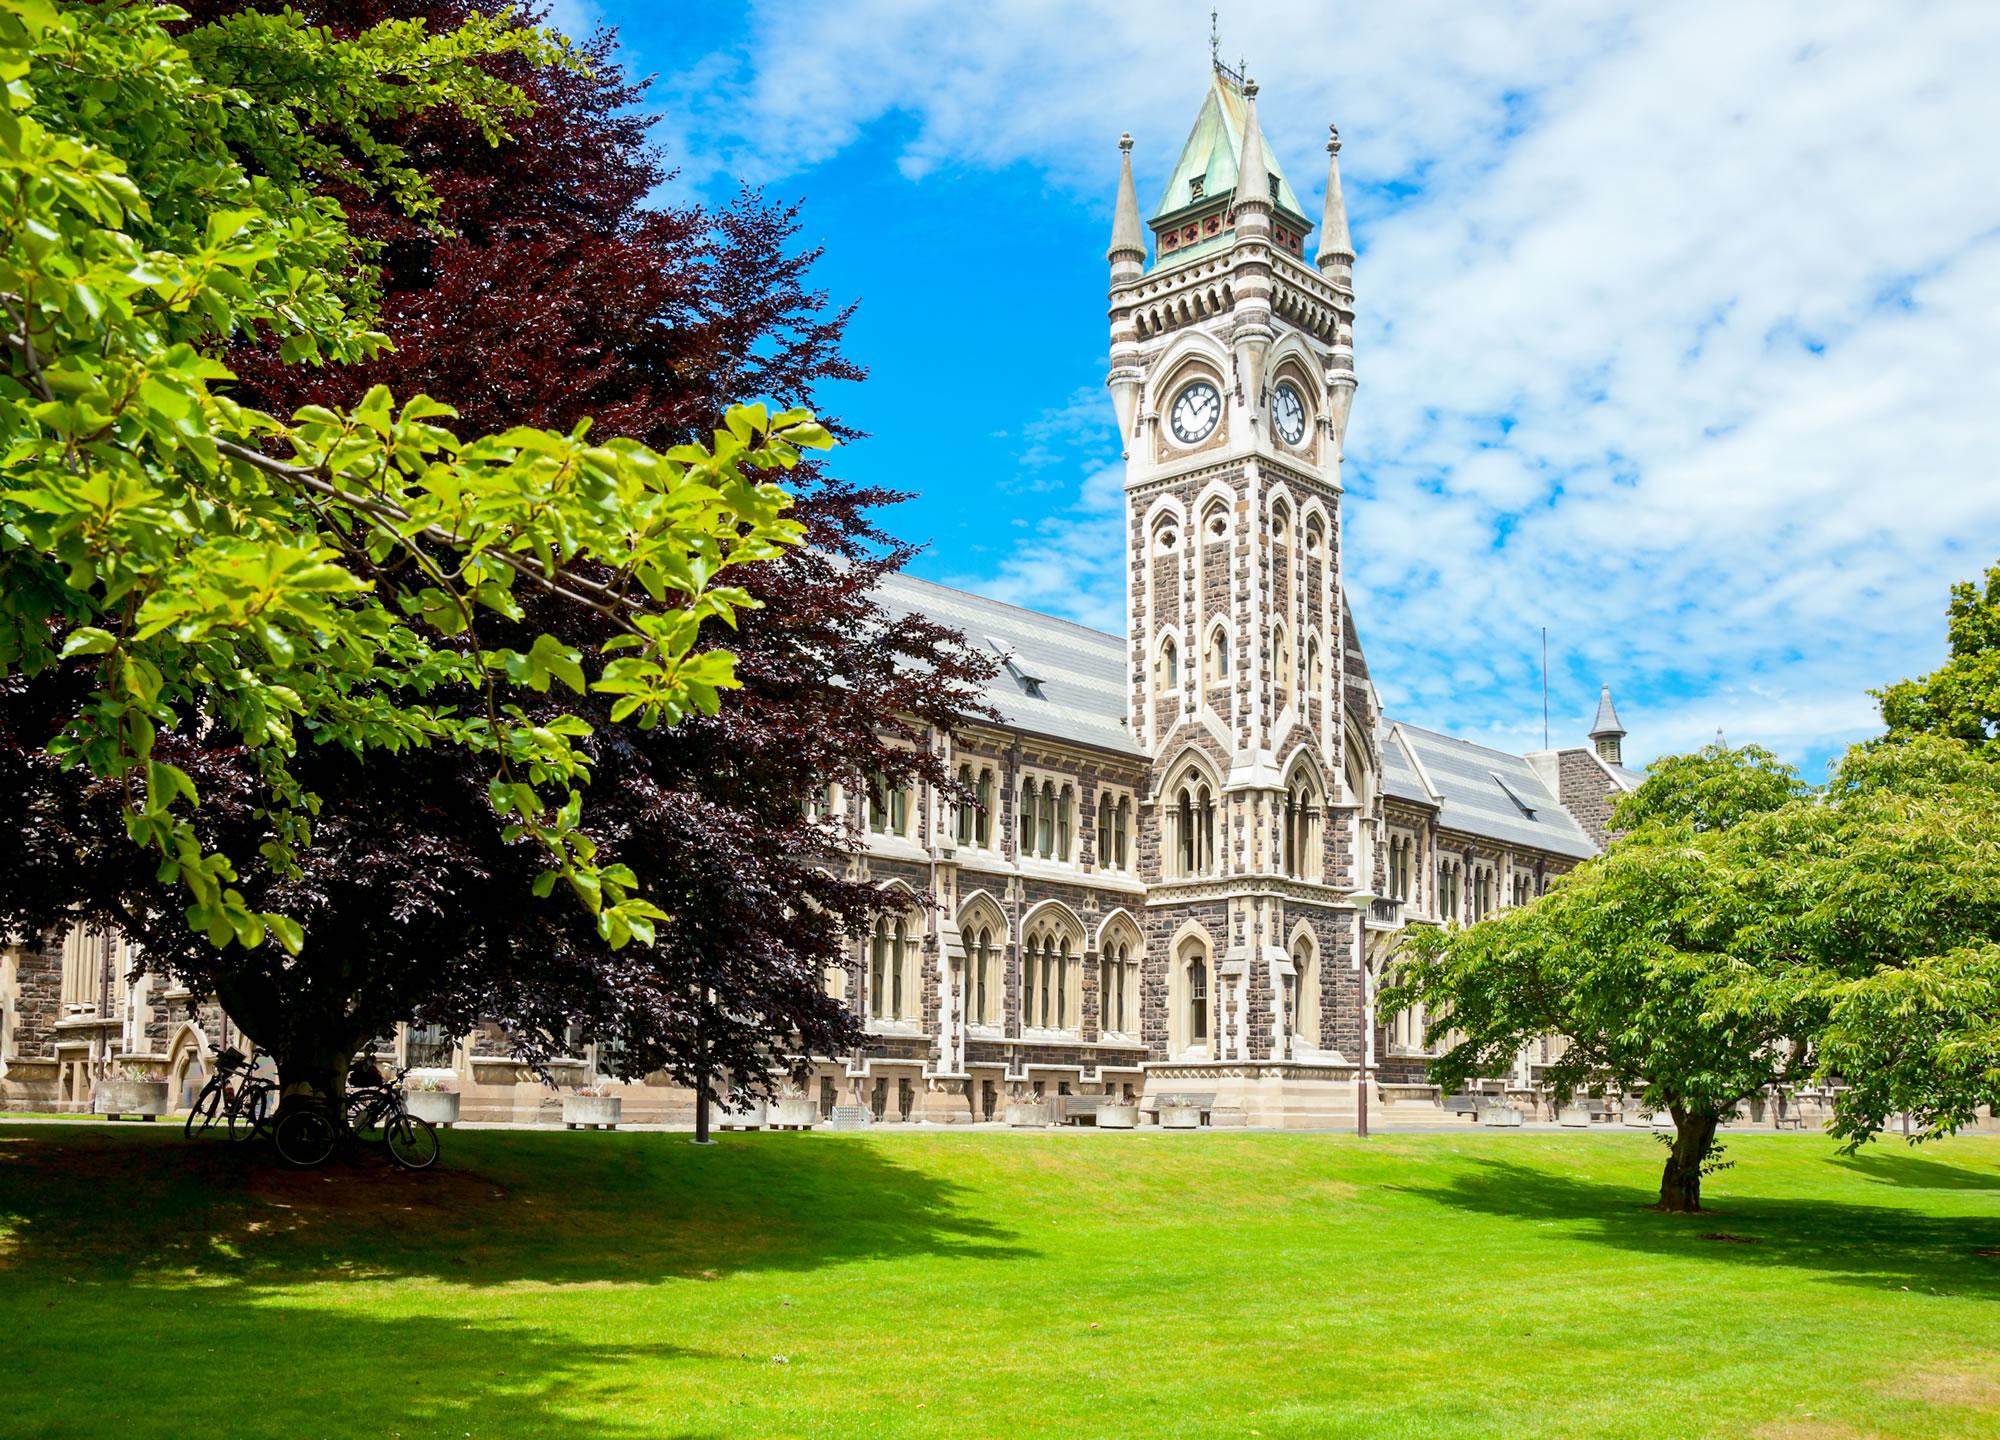 Clocktower of University of Otago, New Zealand